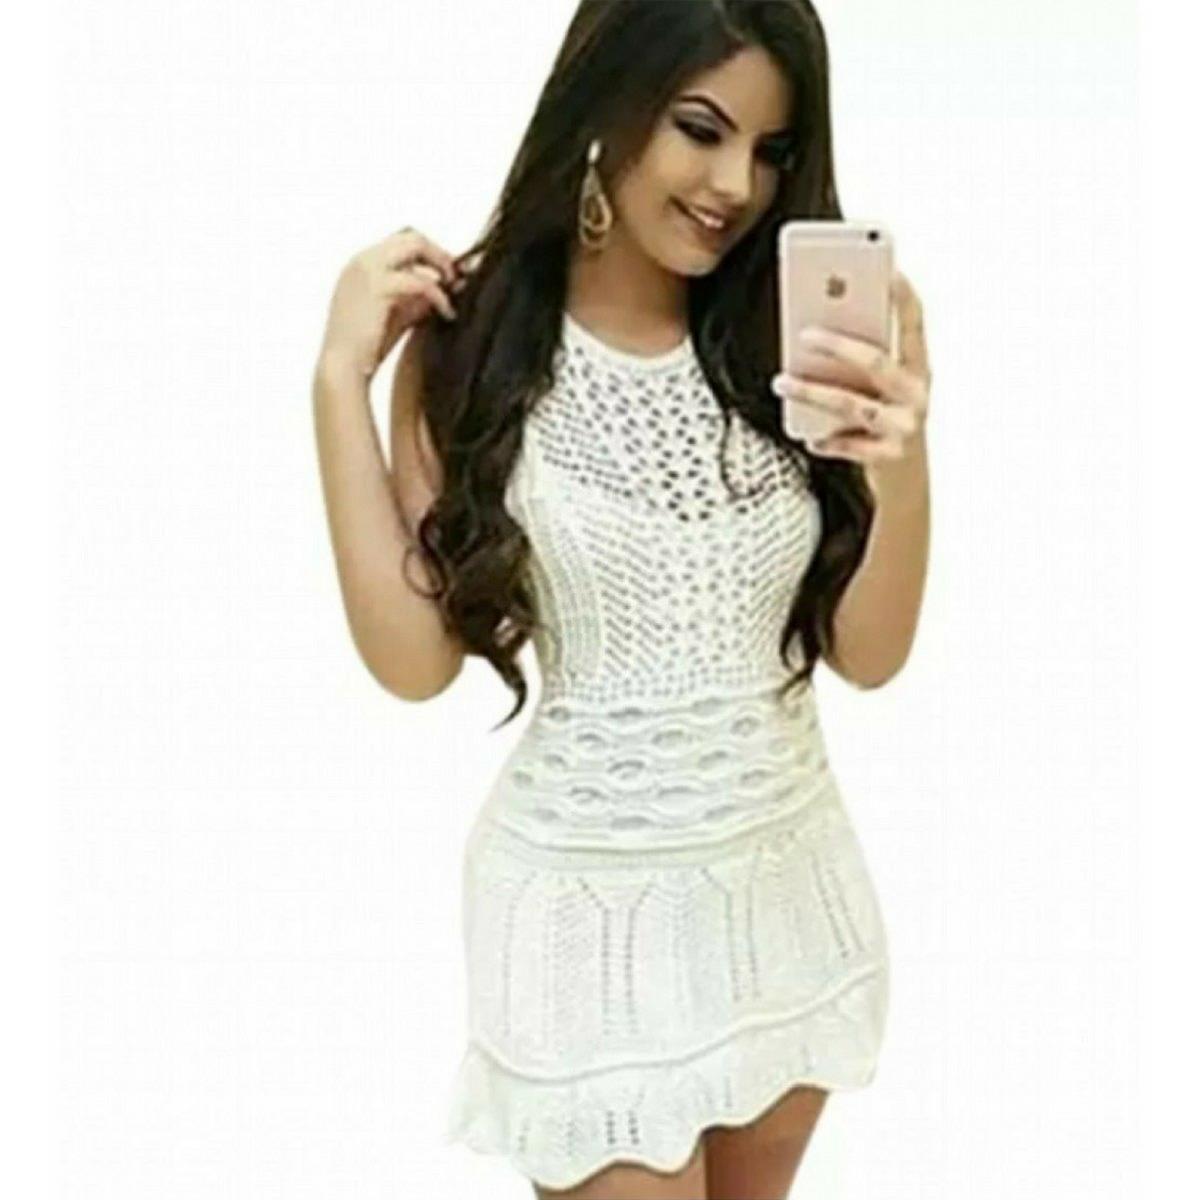 627cd4874b modelo de vestido curto da moda tricot trico roupa feminina. Carregando zoom .